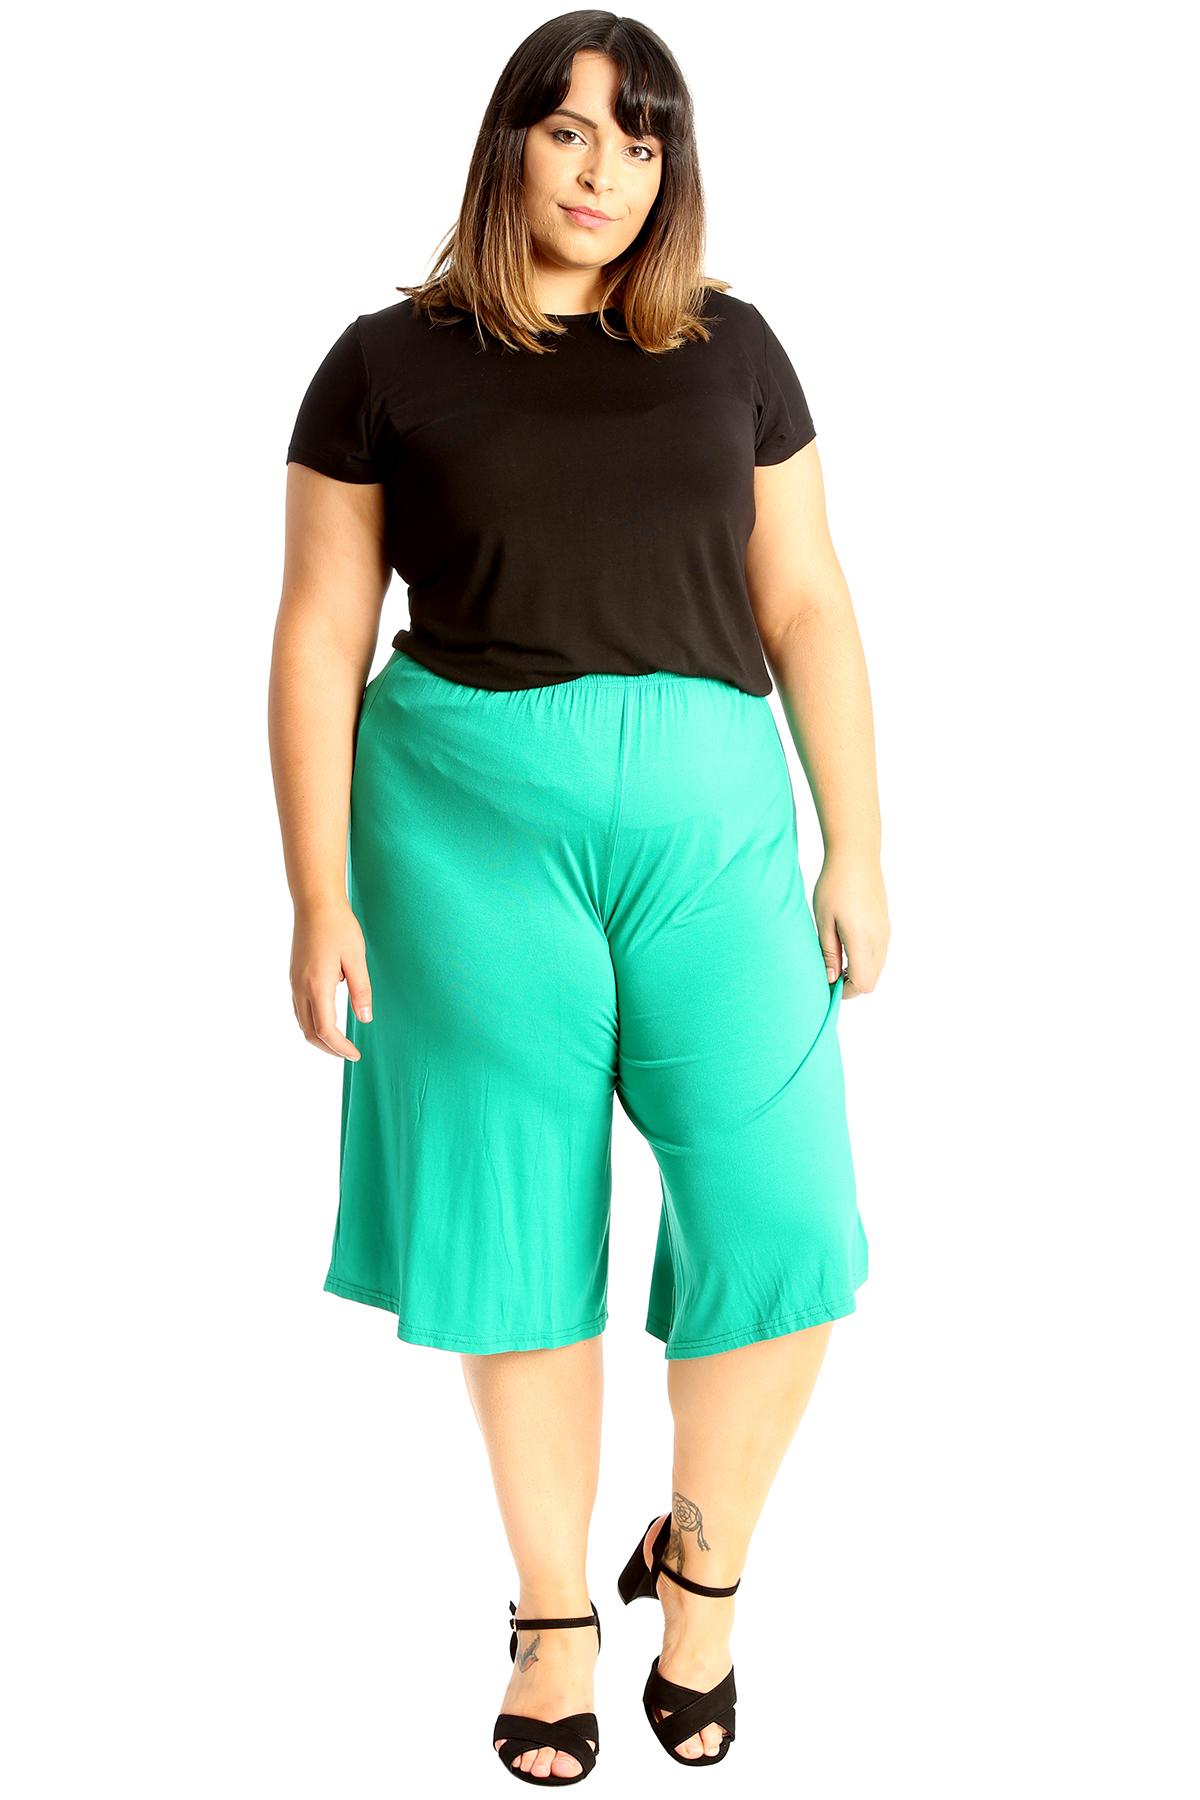 New-Womens-Plus-Size-Culottes-Ladies-Plain-Shorts-Palazzo-Elastic-Pants-Summer thumbnail 50